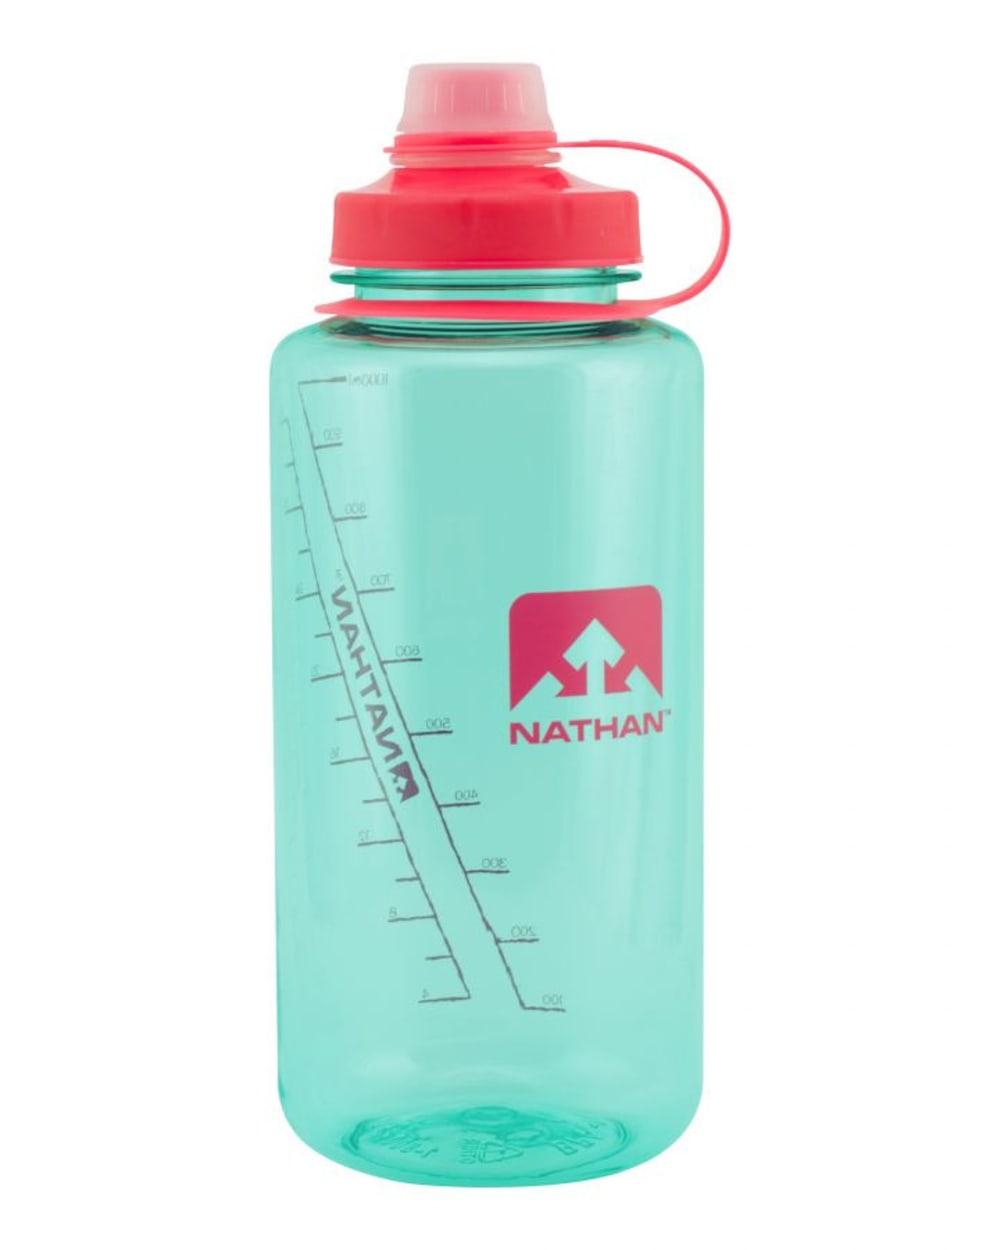 NATHAN BigShot Narrow Mouth Tritan Bottle - BLUE LIGHT